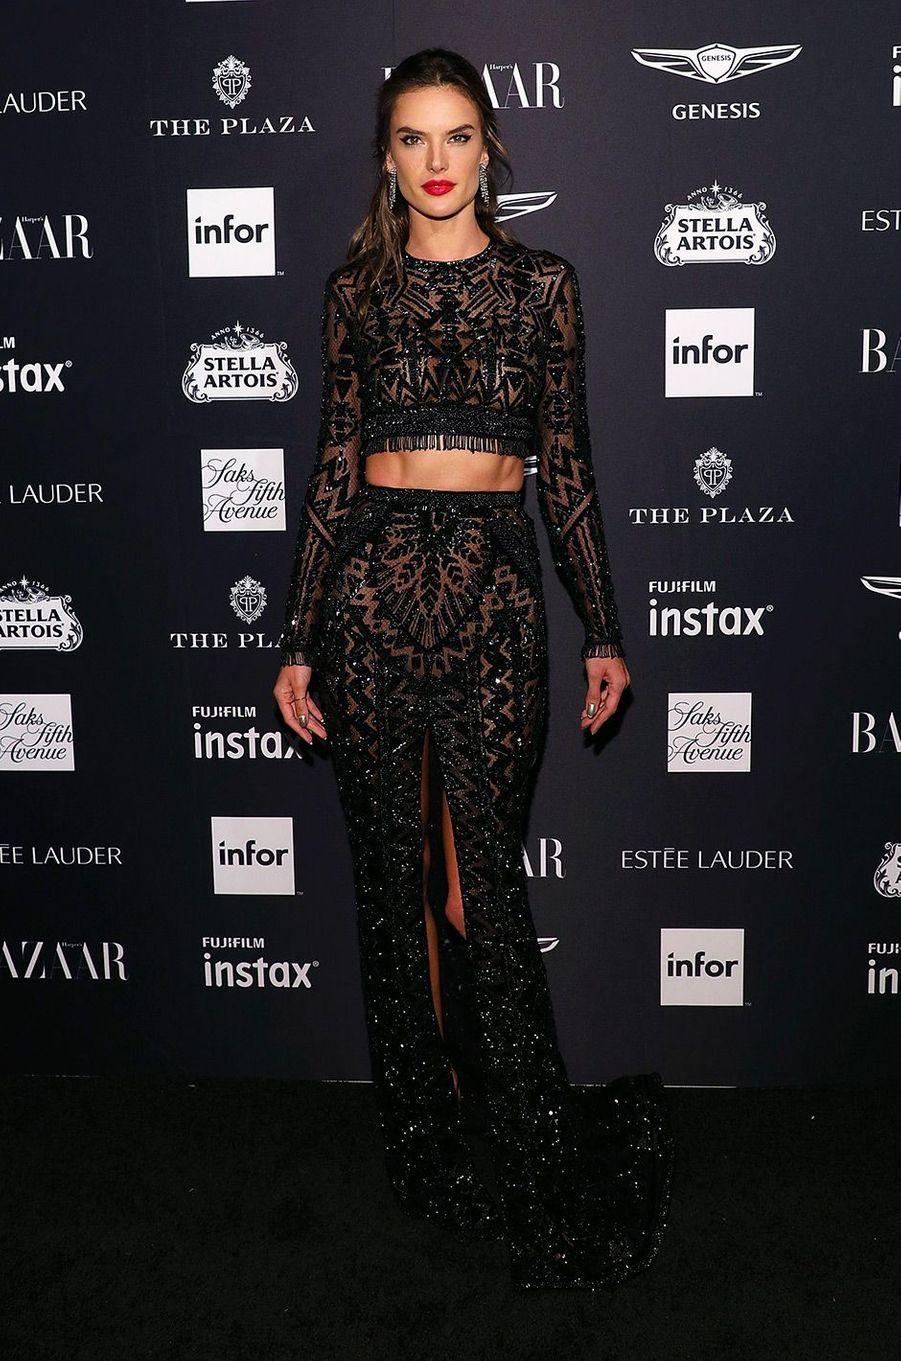 Alessandra Ambrosio à la soirée Harper's Bazaar Icons, vendredi 7 septembre